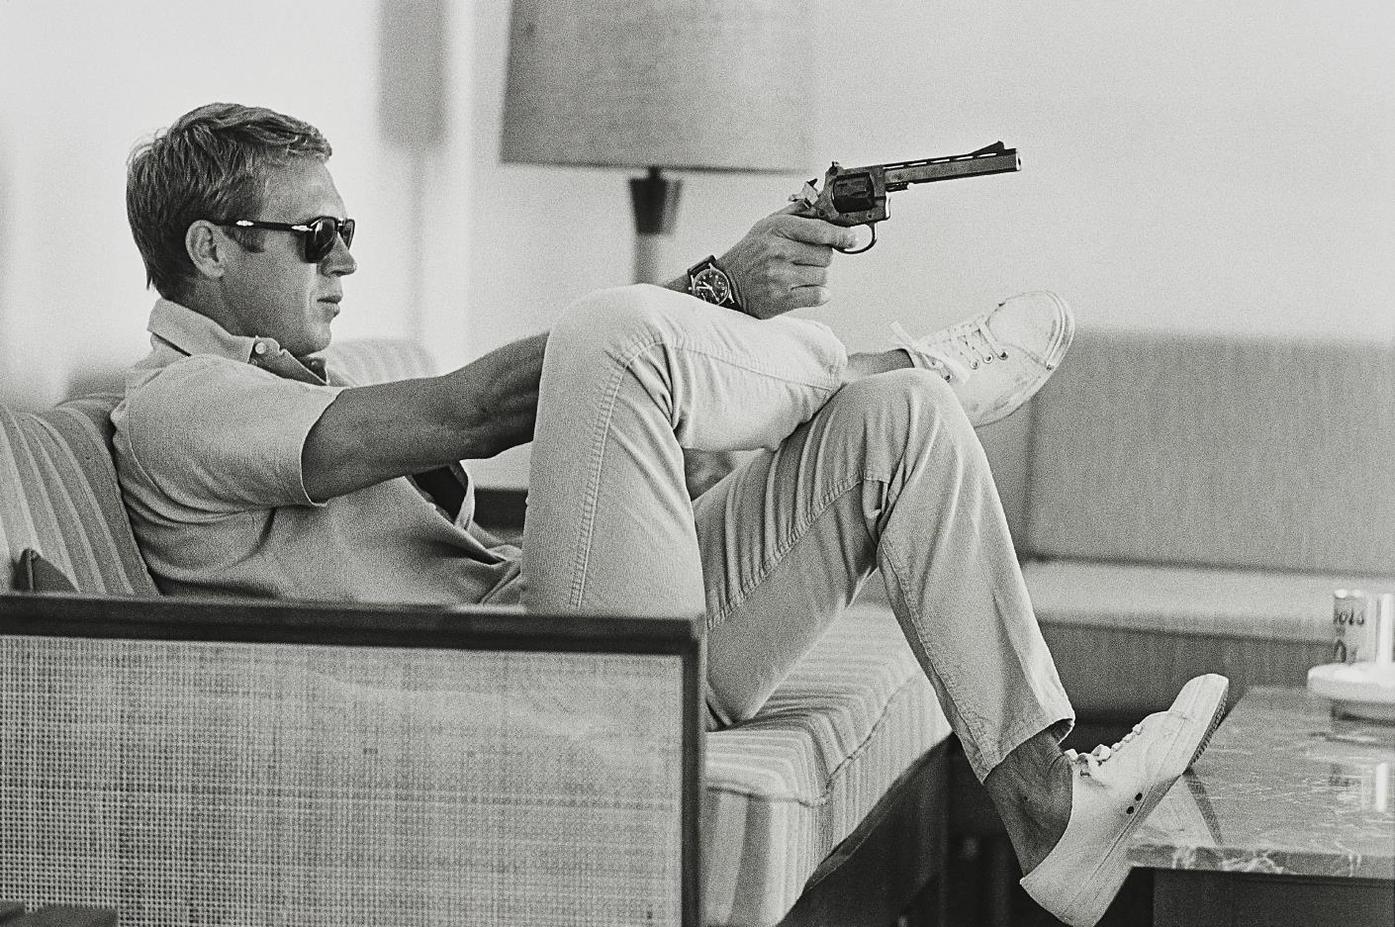 John Dominis - Steve Mcqueen Aims A Pistol In His Living Room, California-1963